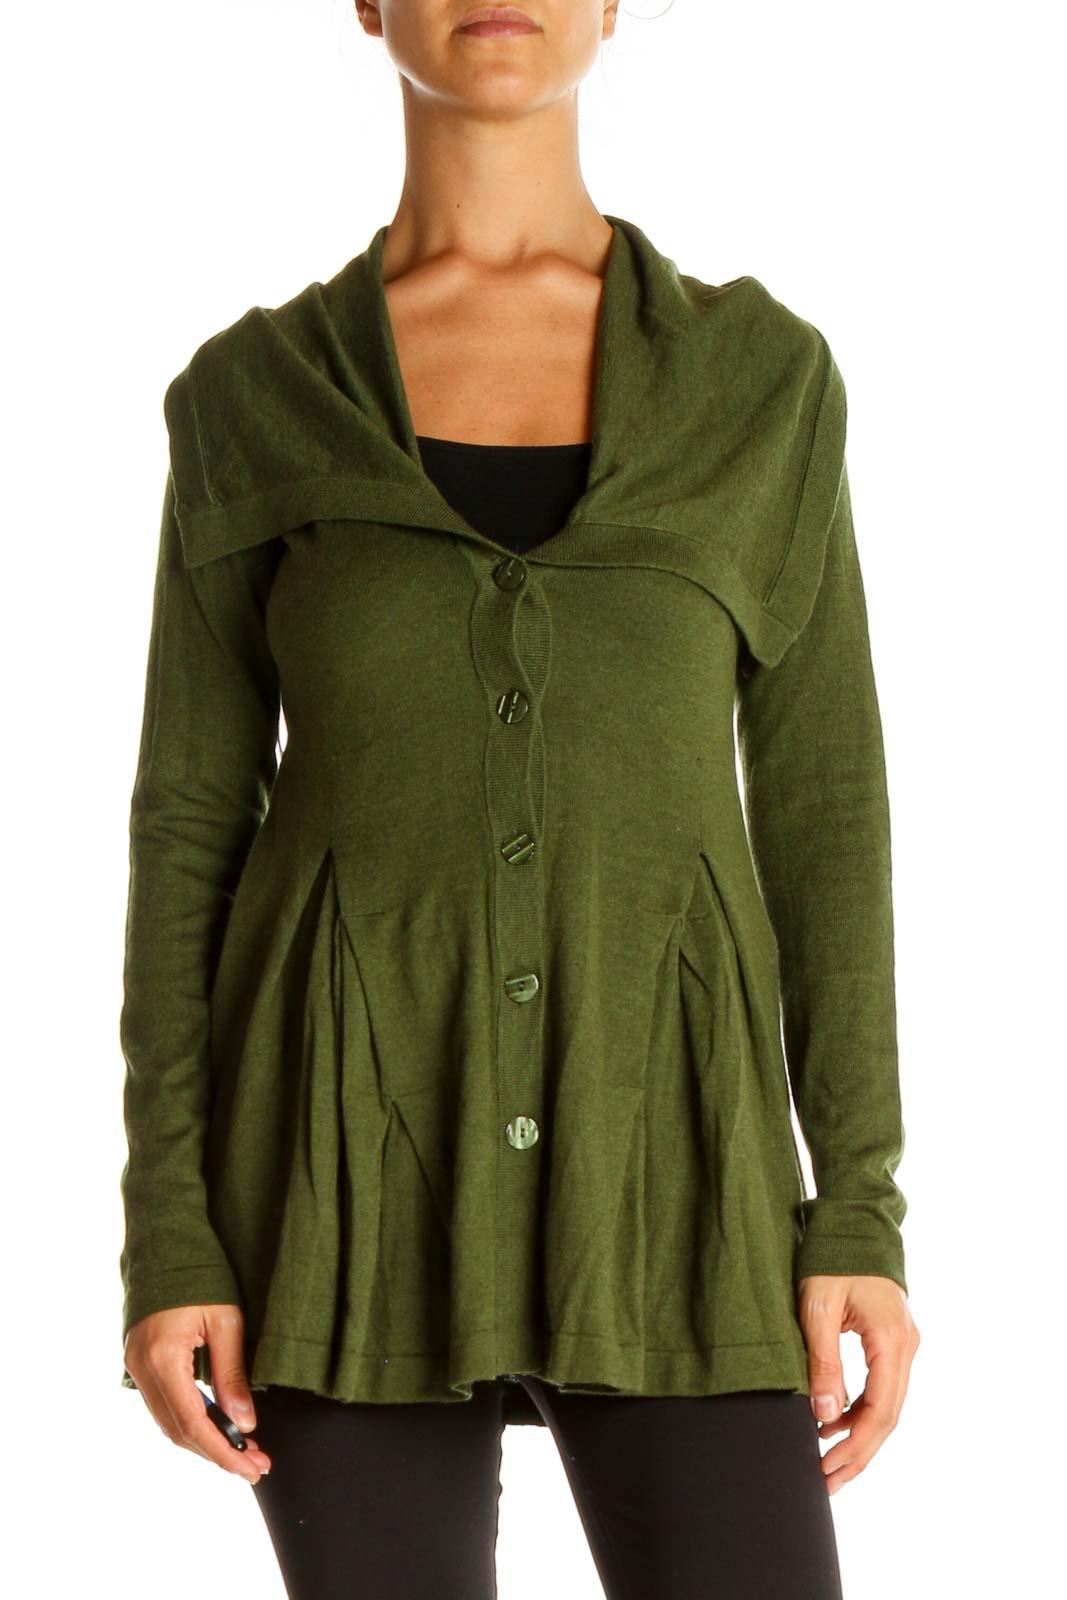 Green Cardigan Front